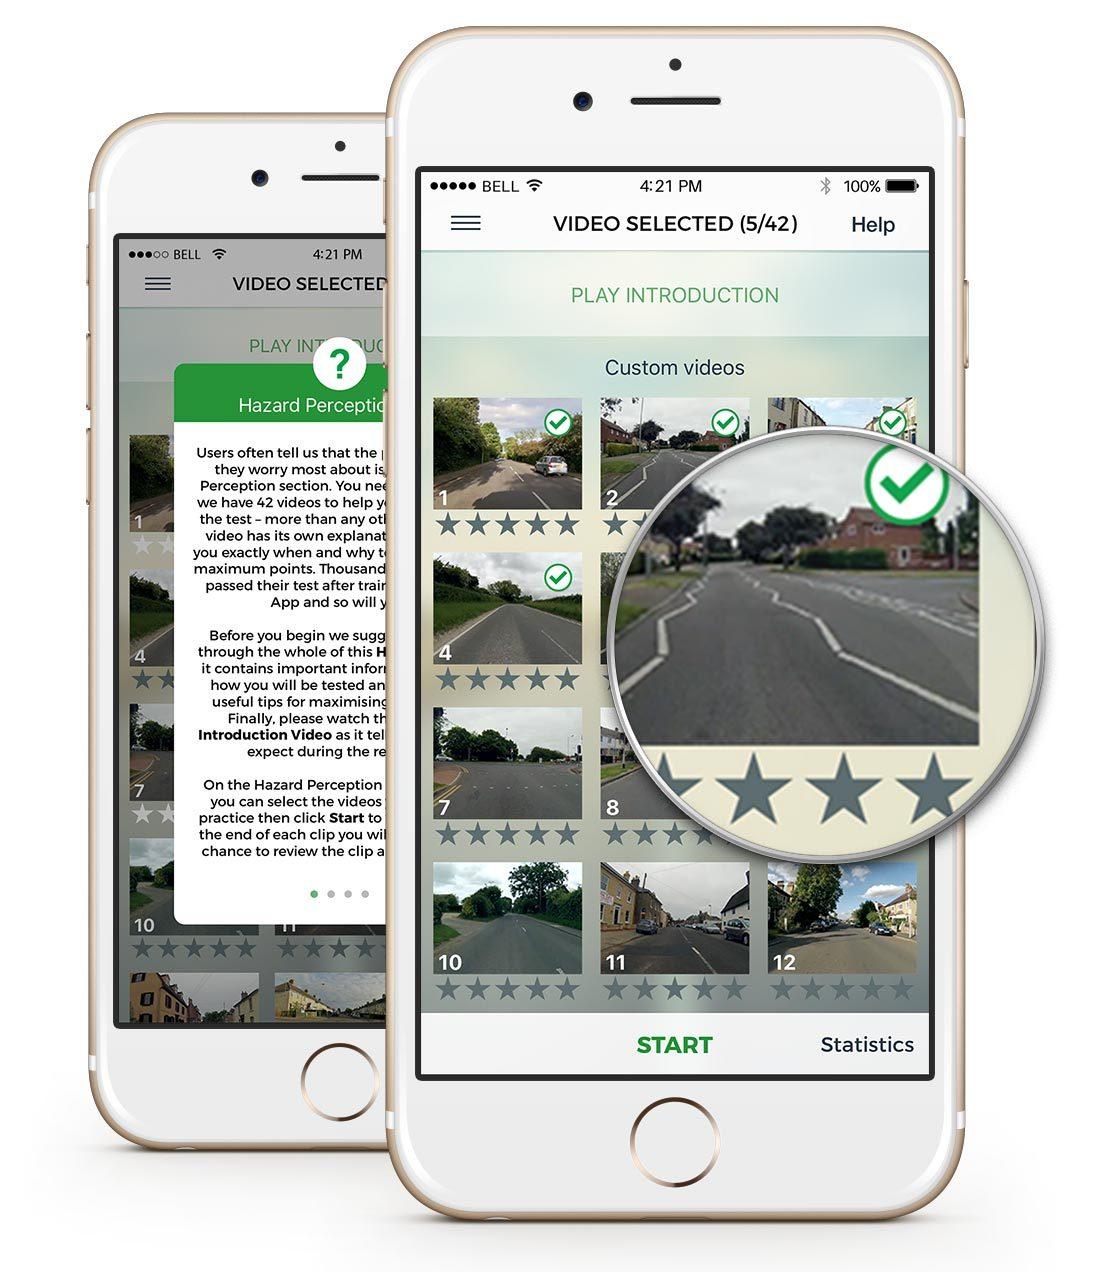 App screen 2